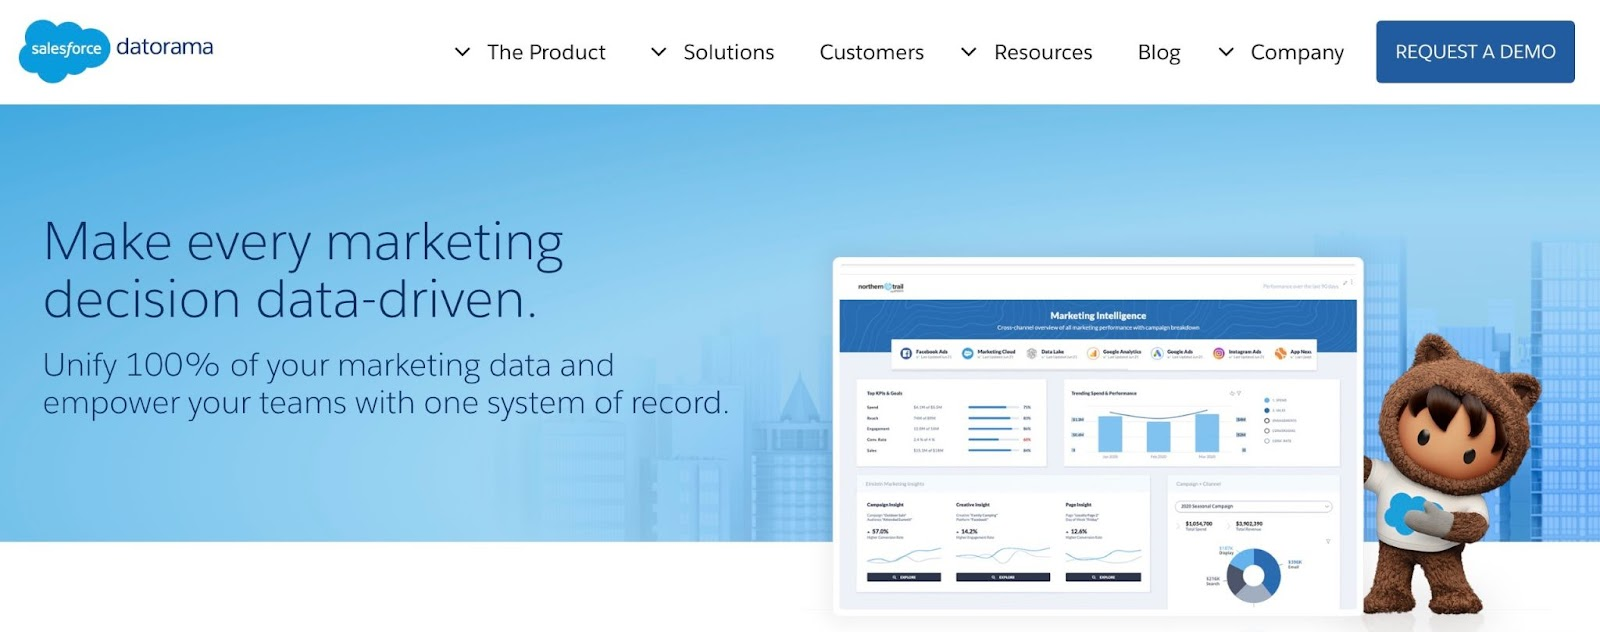 Datorama homepage: Make every marketing decision data-driven.